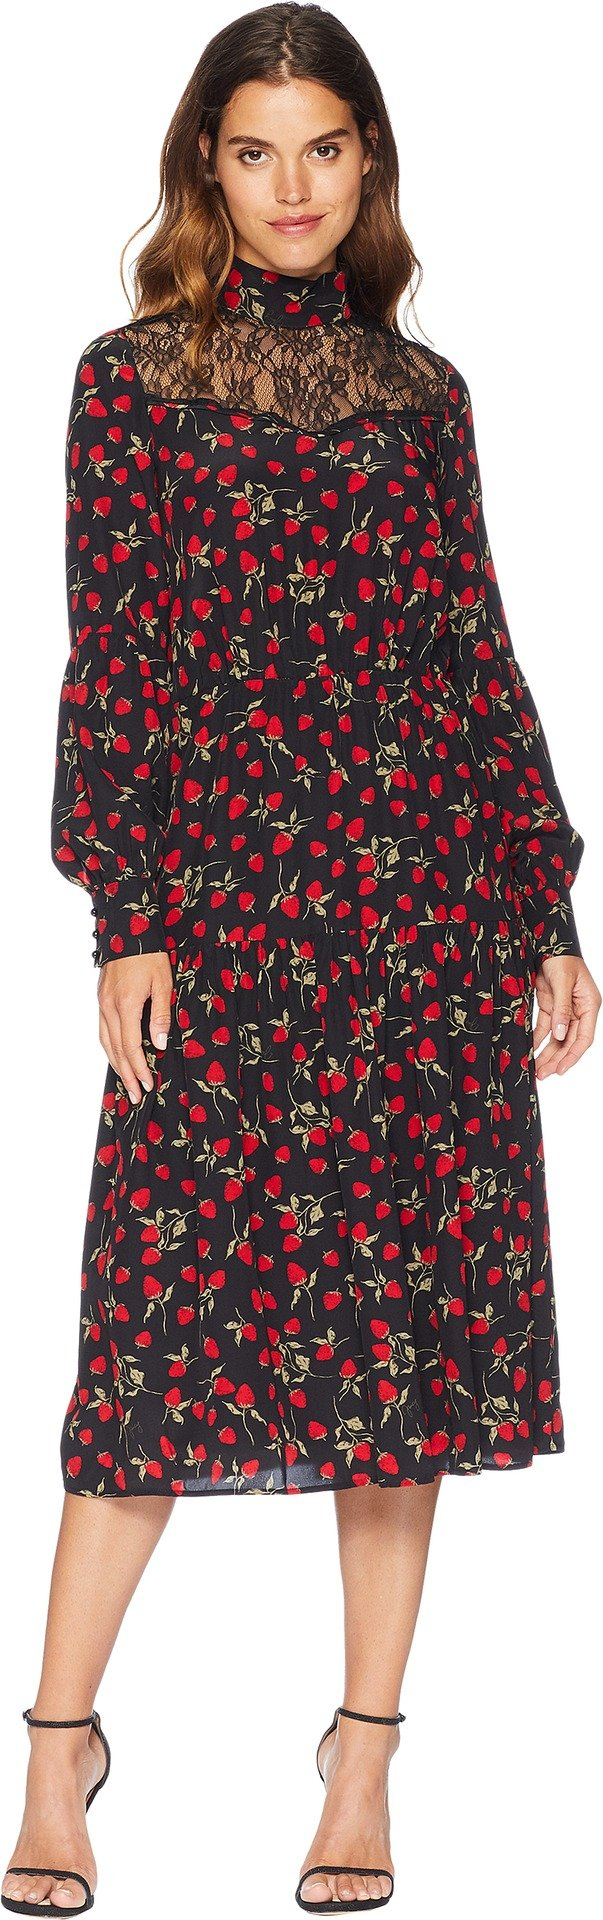 Juicy Couture Women's Strawberry Print Silk Midi Dress Pitch Black Strawberry Fields Large